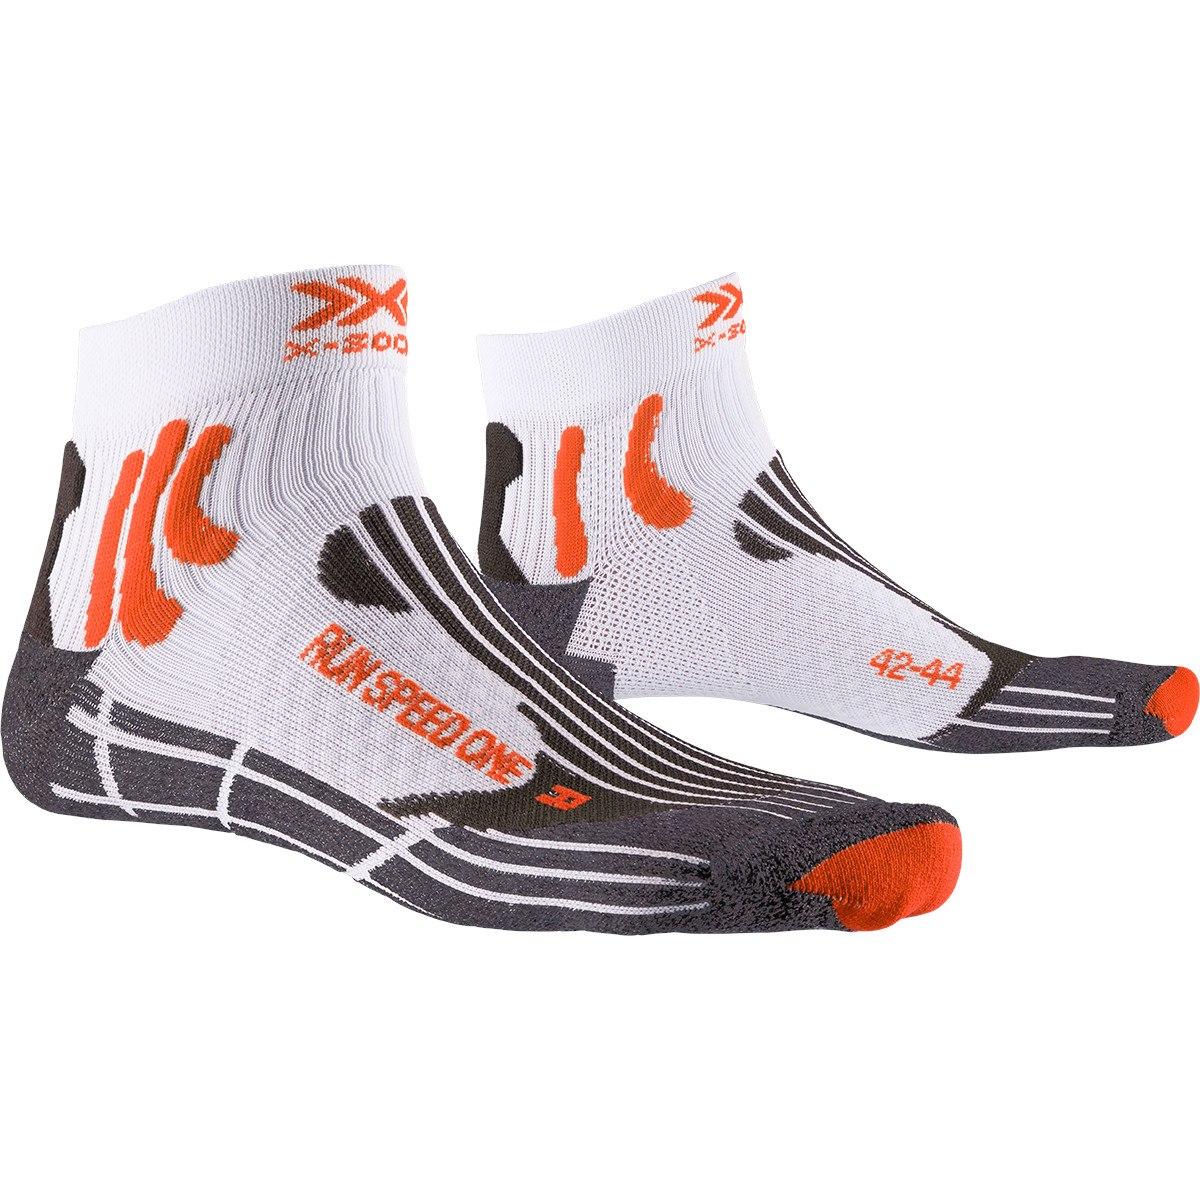 X-Socks Run Speed One Laufsocken - white/x-orange/grey